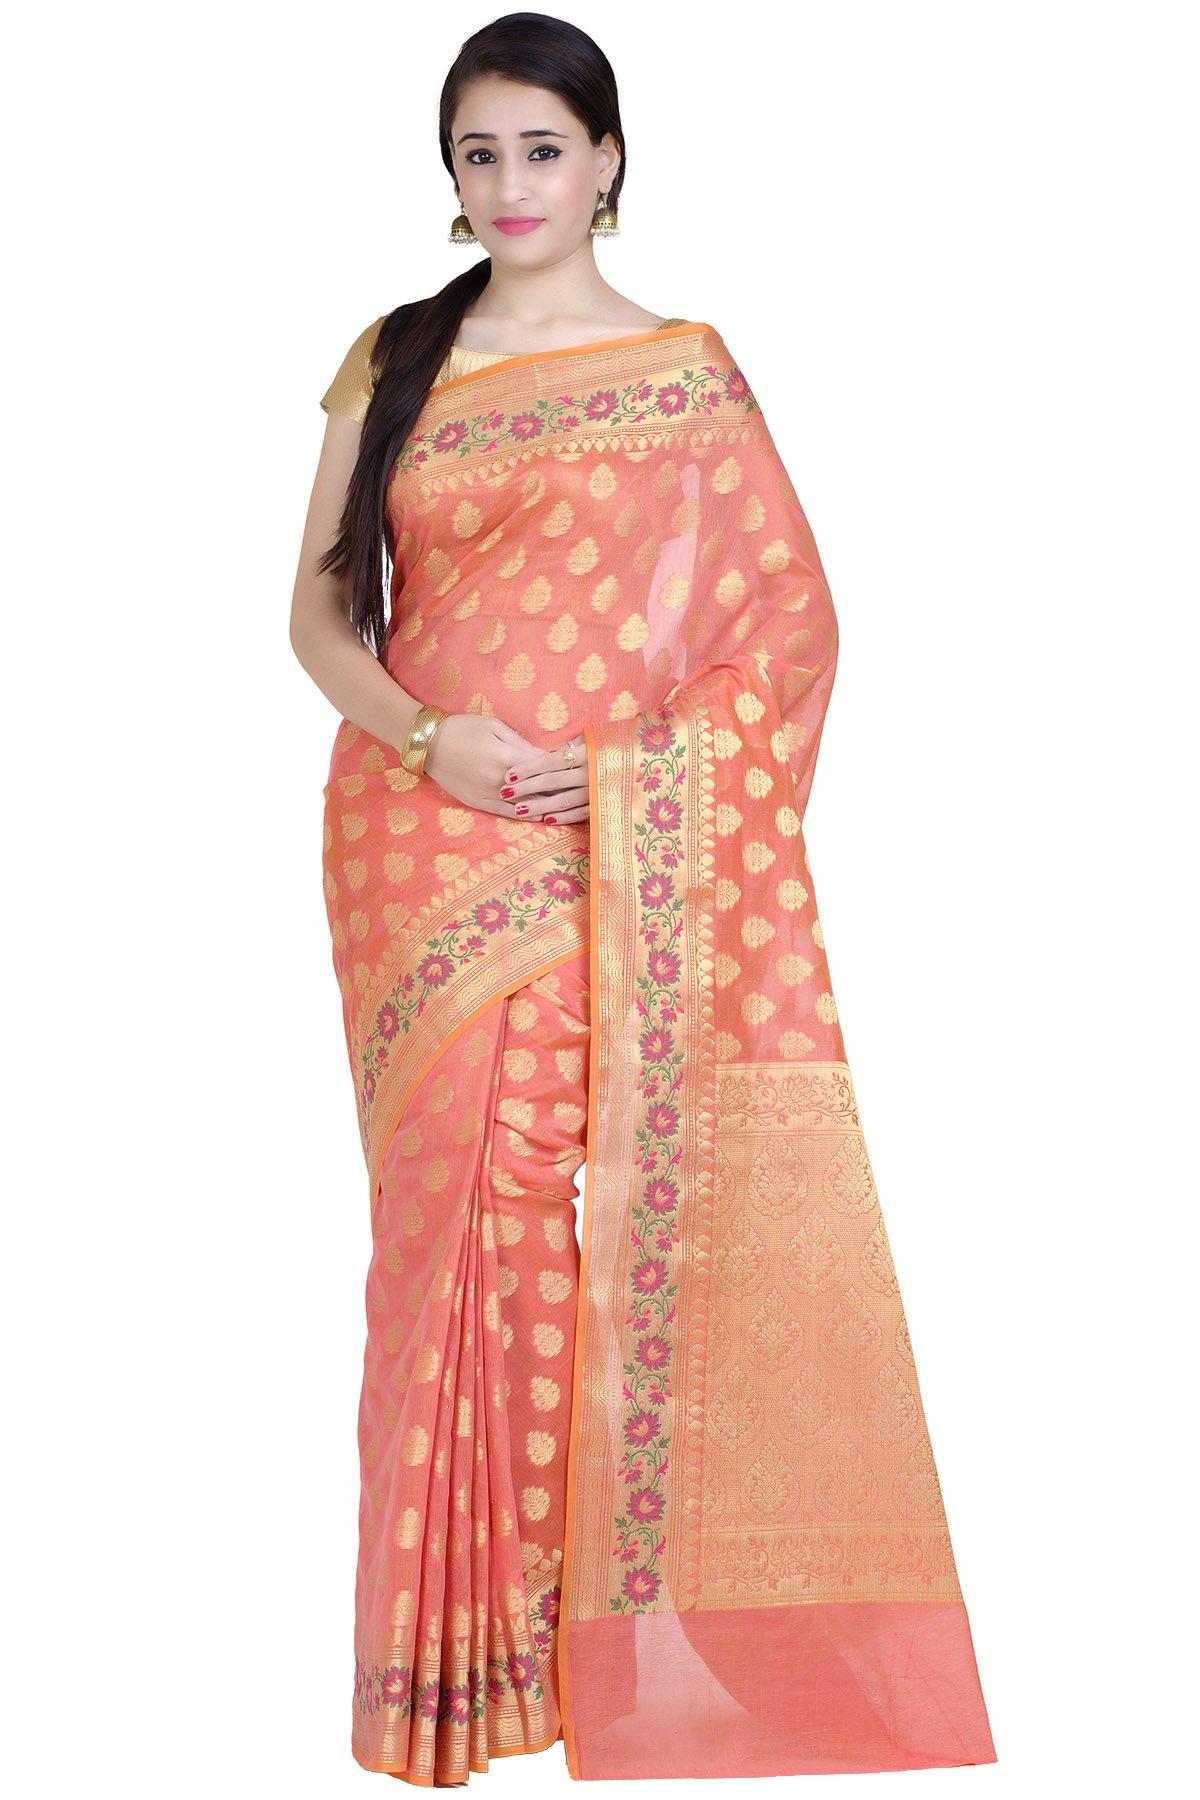 Chandrakala Women's Peach Mercerize Cotton Banarasi Saree(1271PEA)